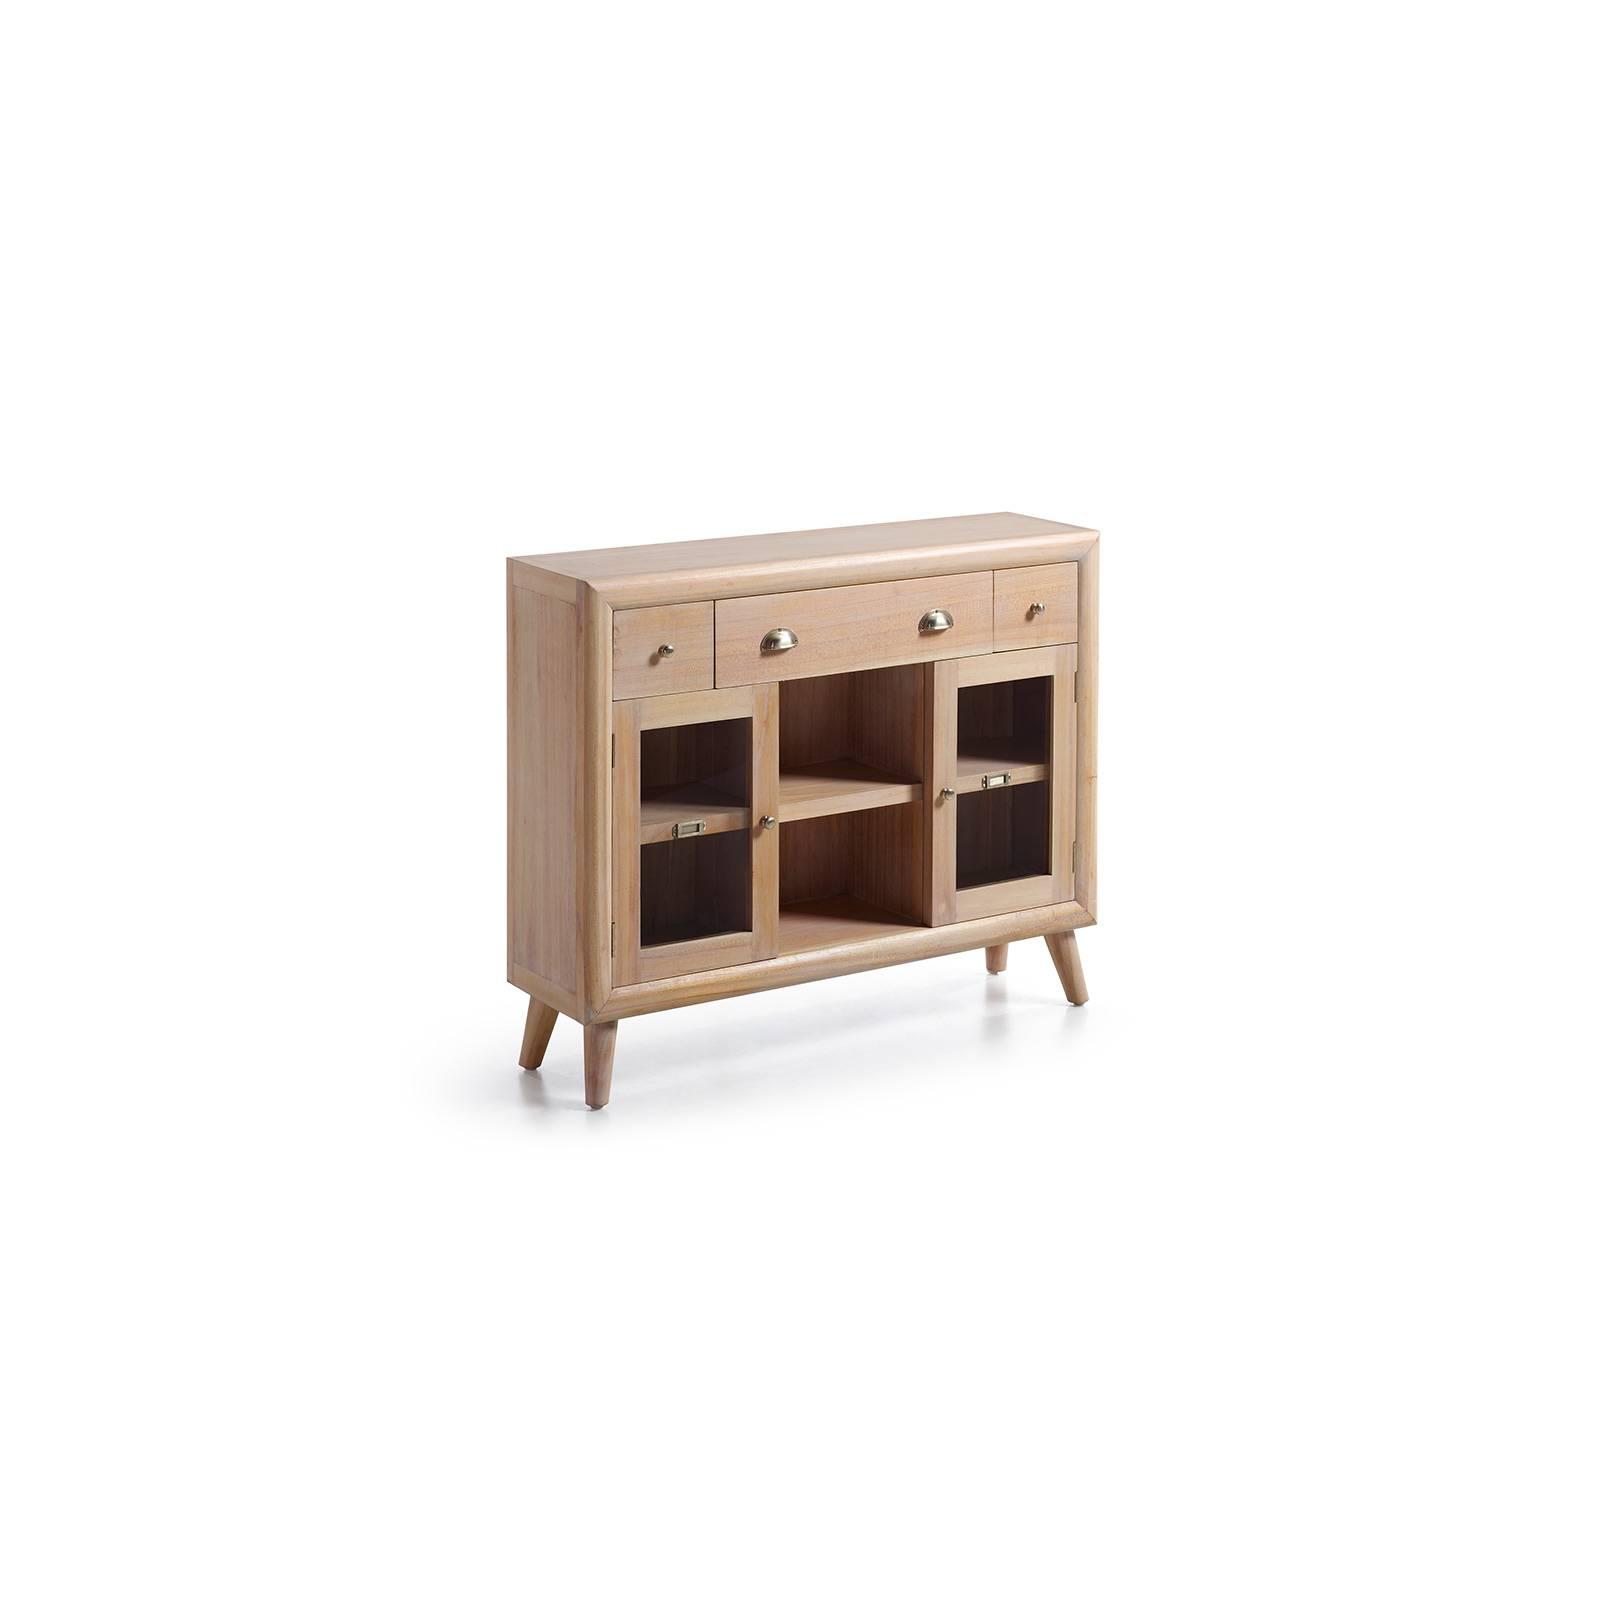 Console Vitrée Oslo Mindy - meubles scandinaves